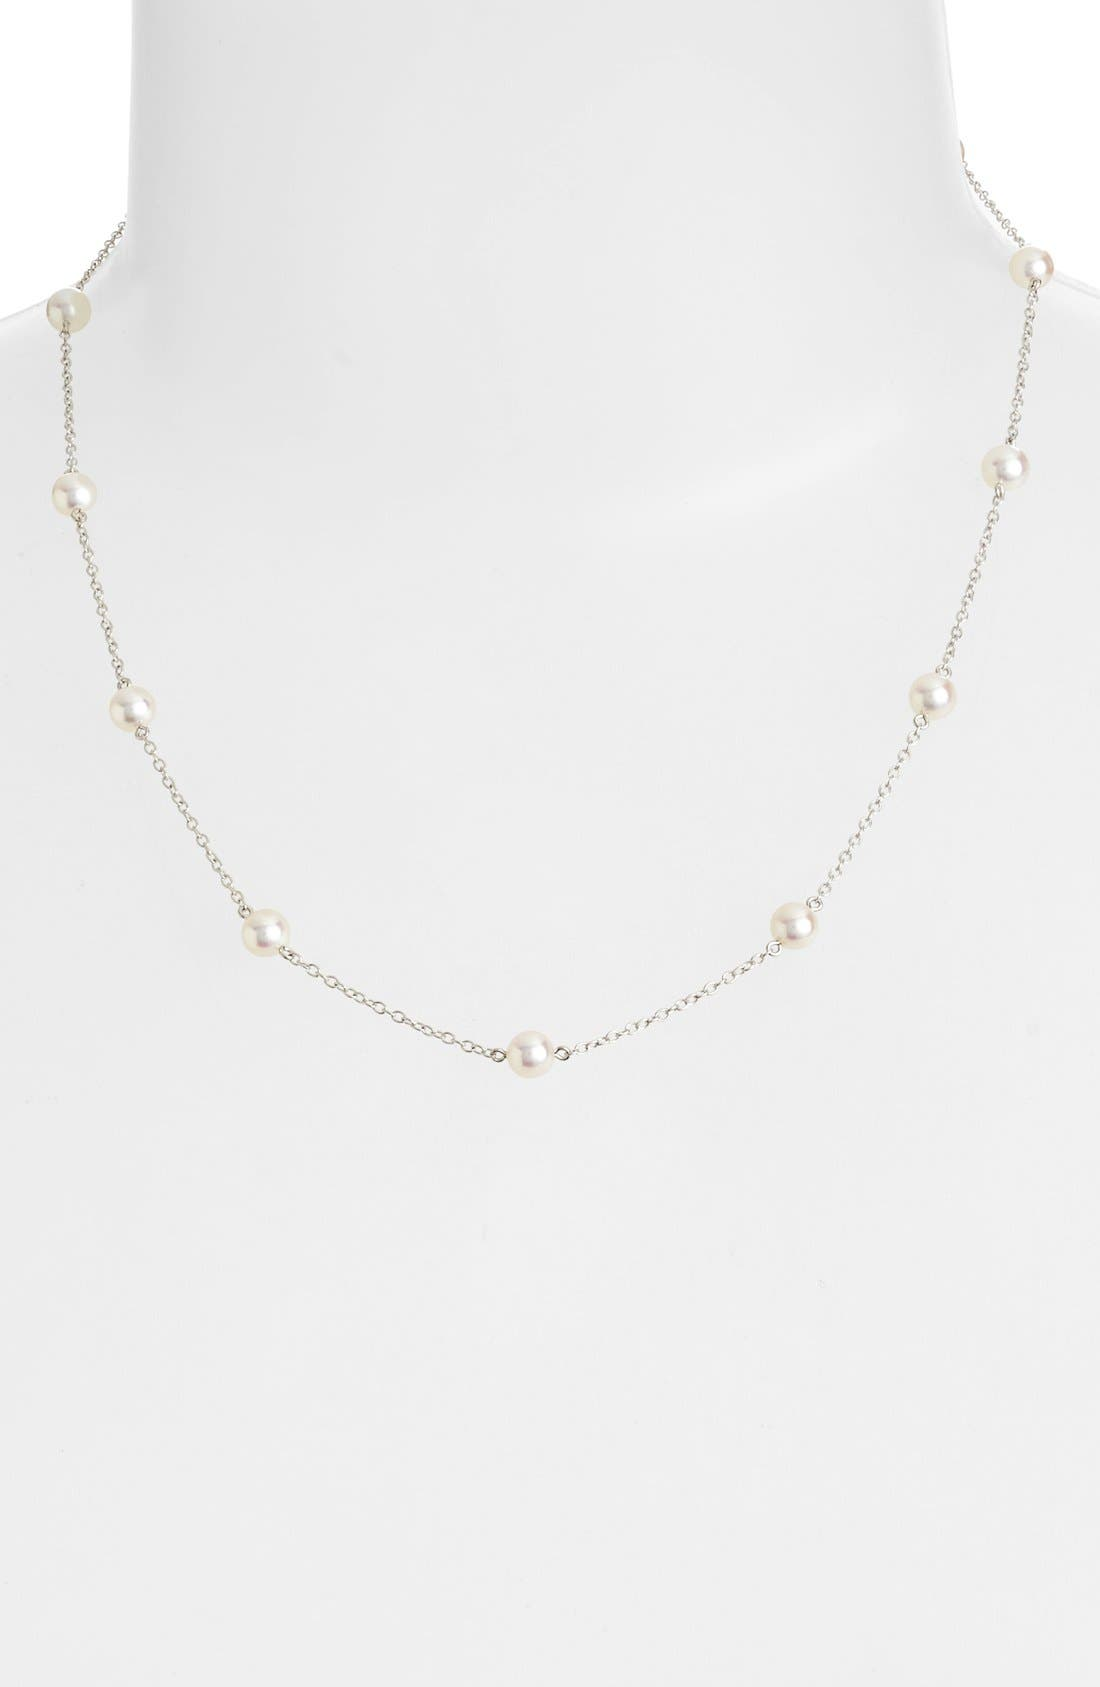 Main Image - Mikimoto Chain & Pearl Necklace